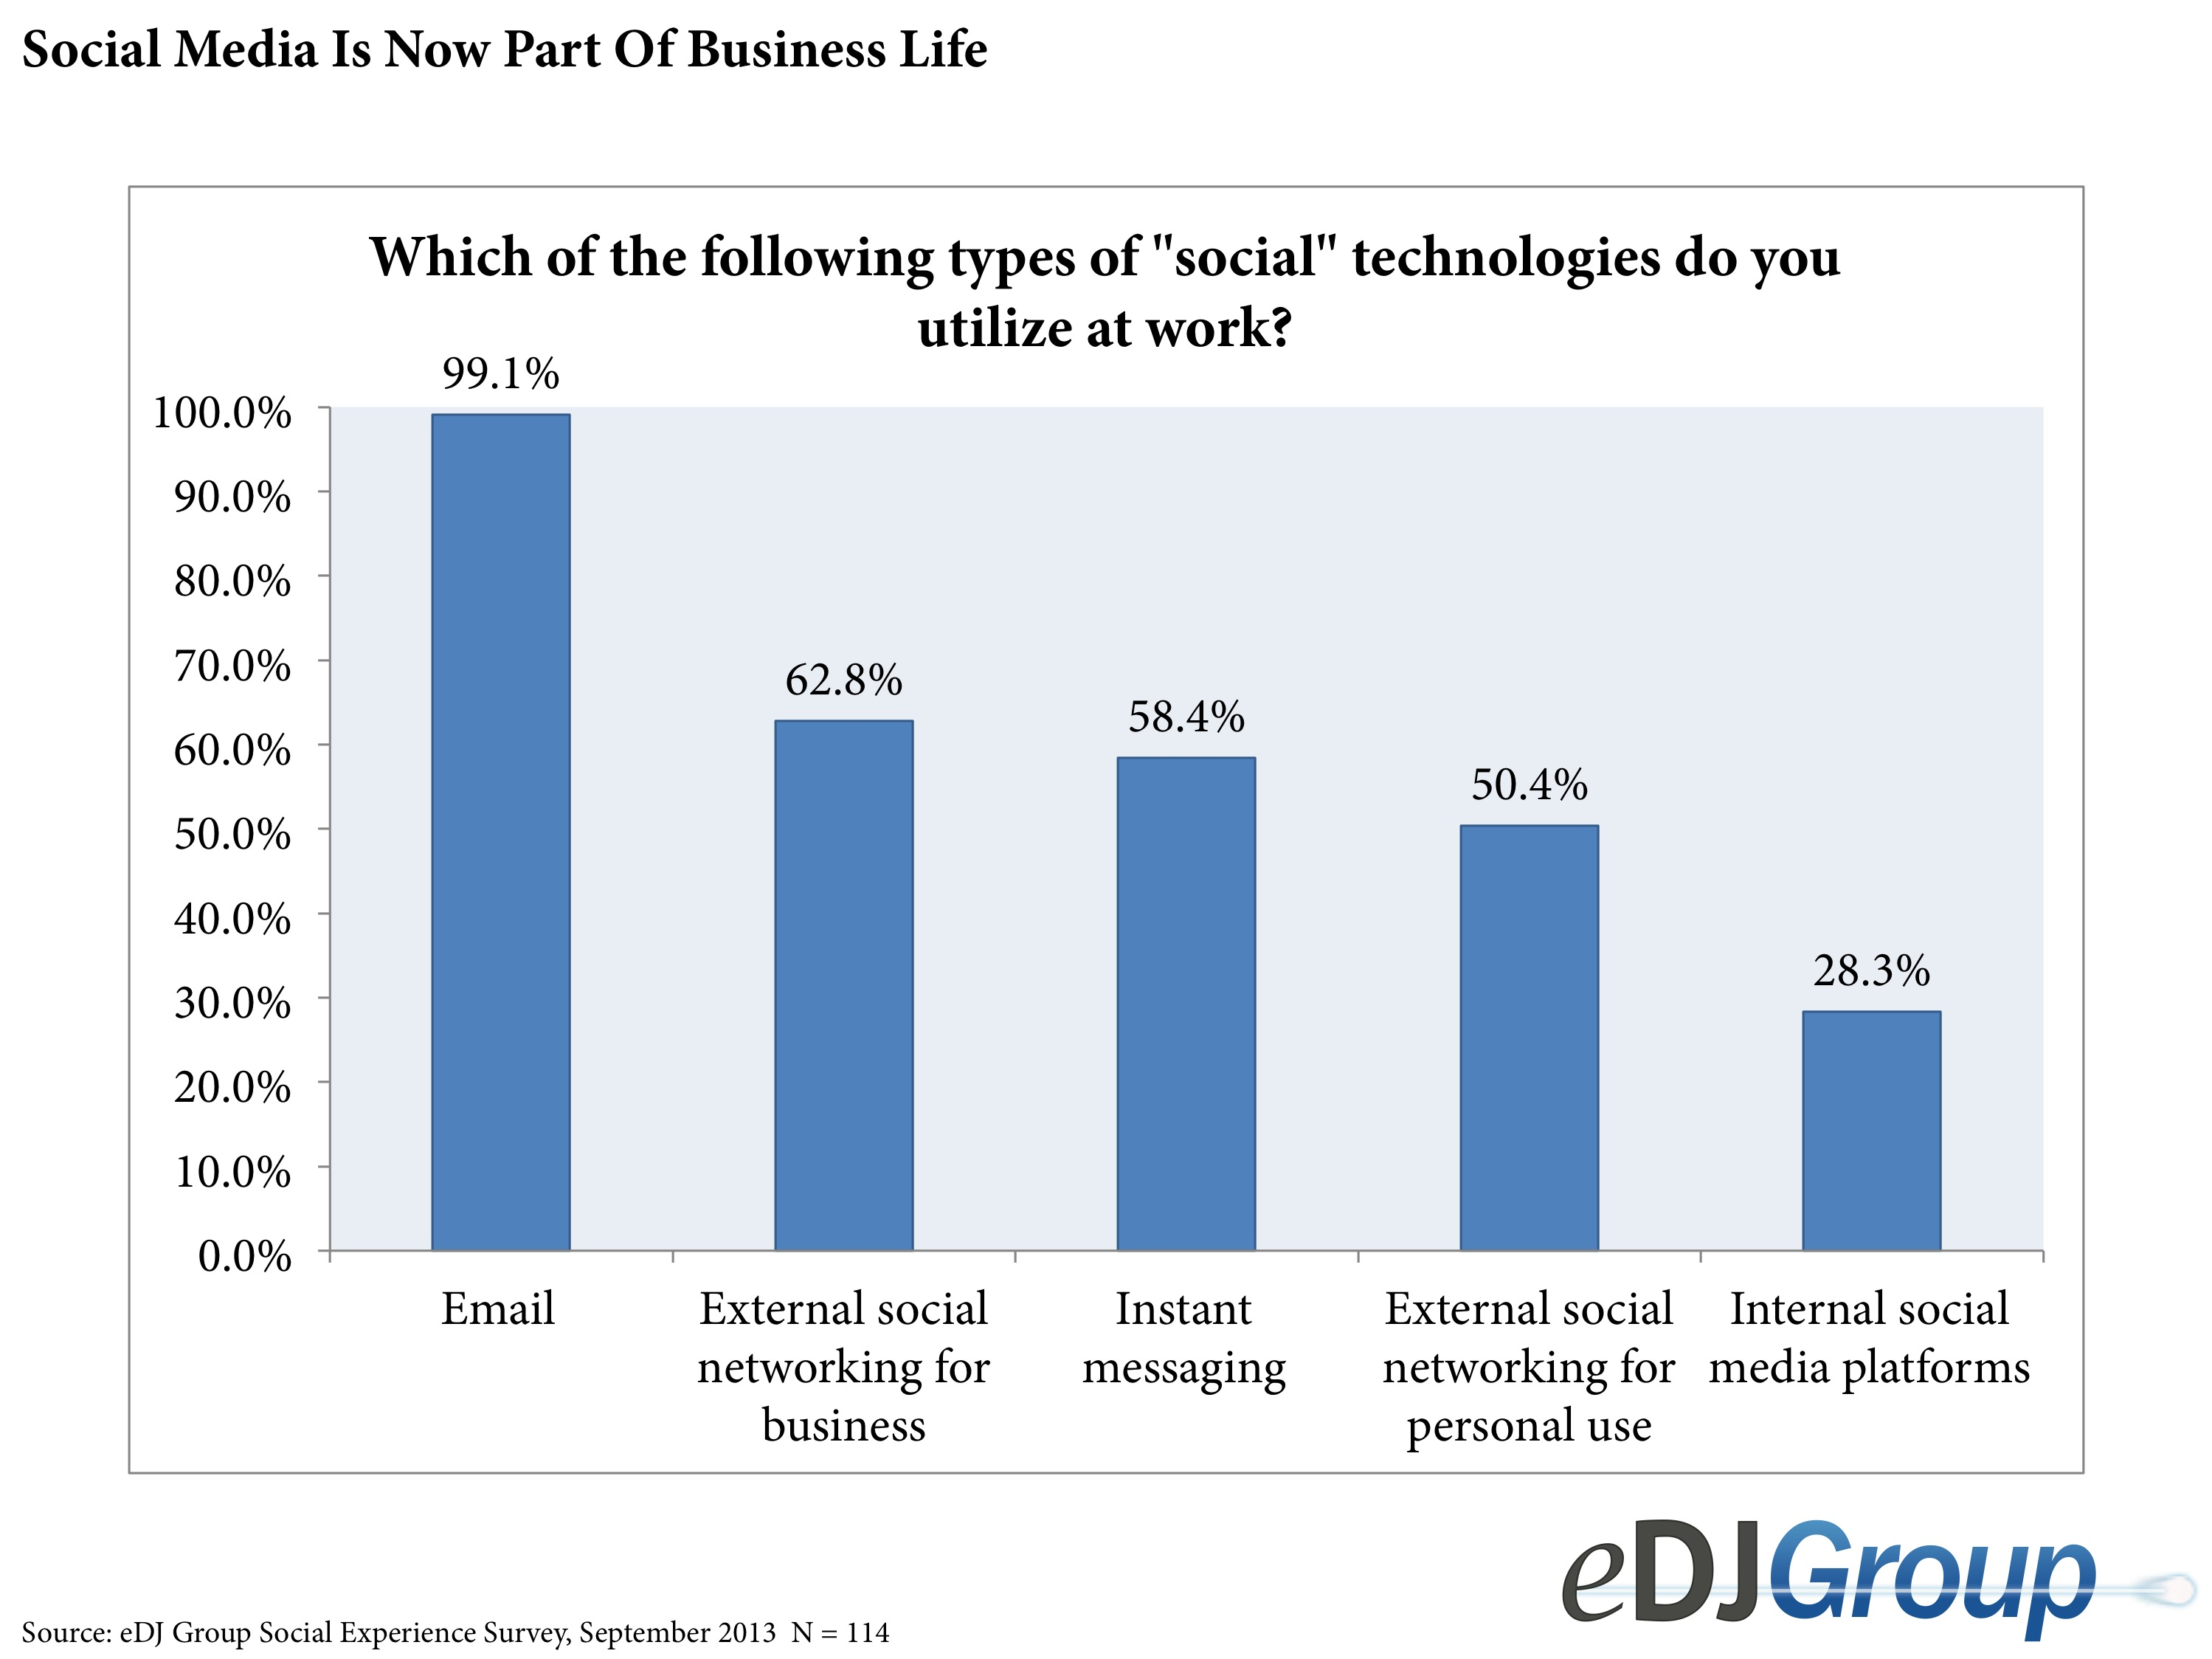 eDJ data on social media usage